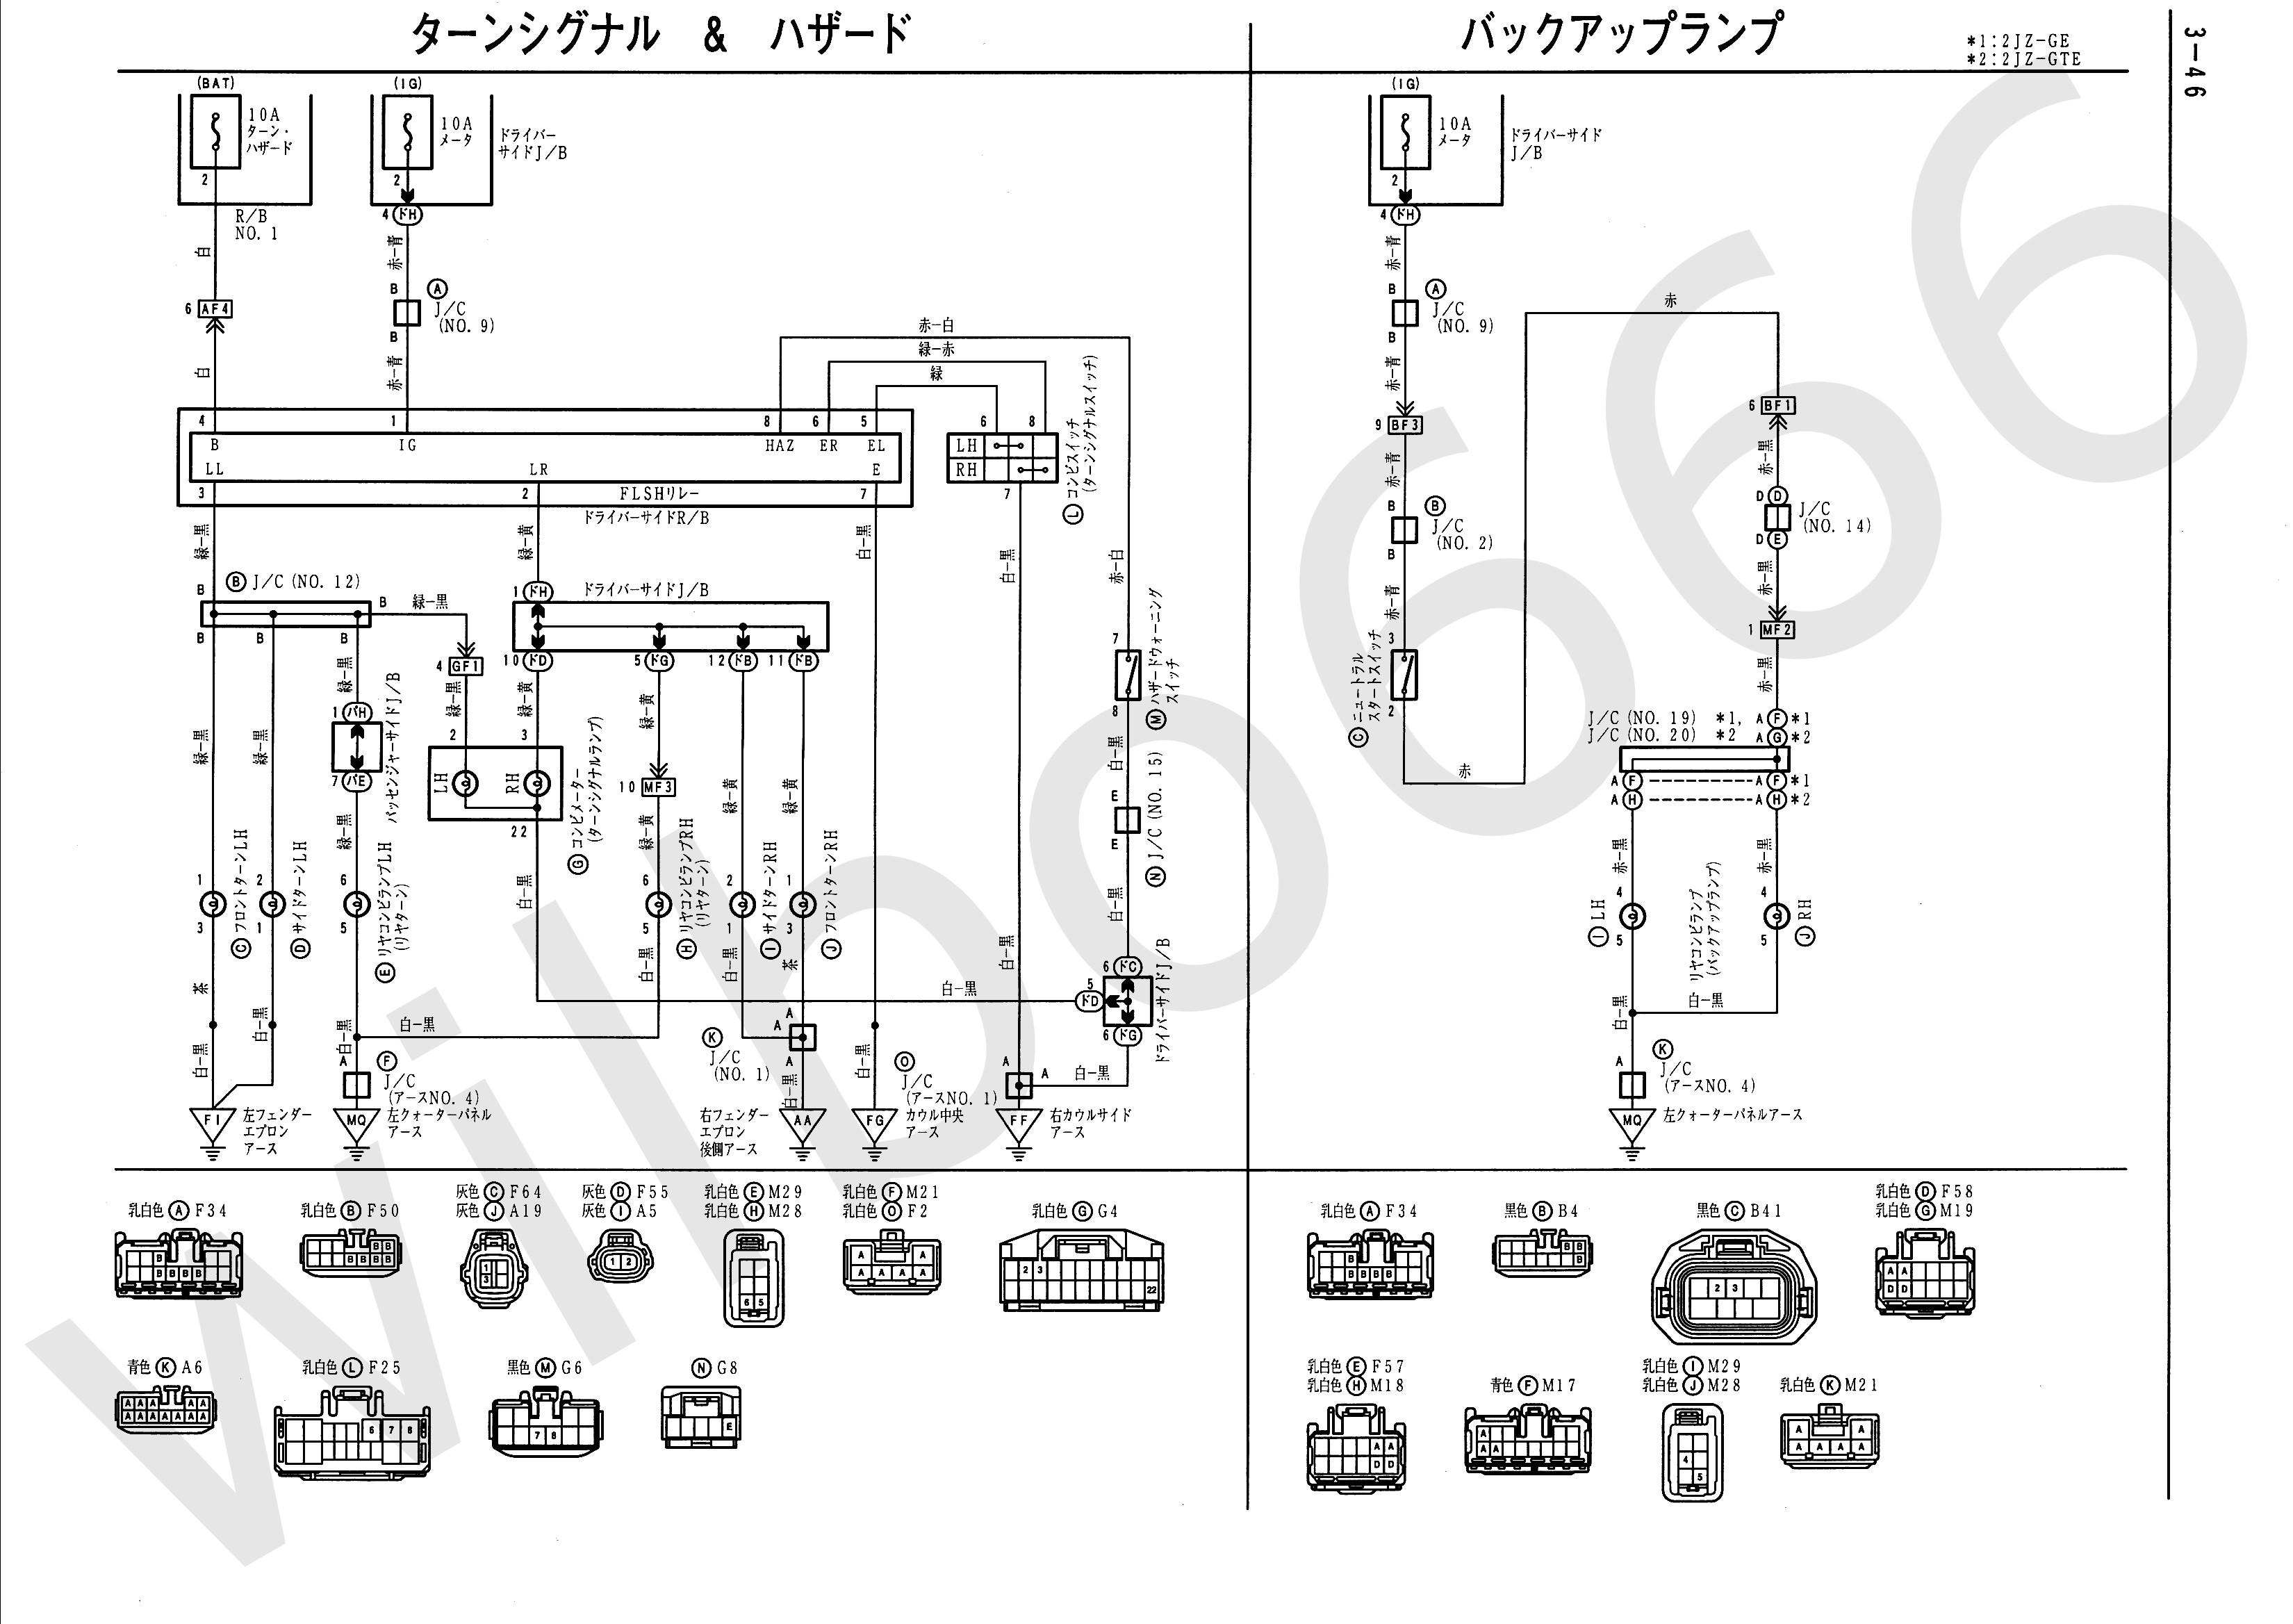 [WQZT_9871]  HG_4277] Engine Wiring Diagram Ge Sensor Wiring Diagram 2Jz Vvt I Engine  Wiring Wiring Diagram | Vvt I Engine Wiring Diagram |  | Birdem Eachi Winn Usnes Oper Wigeg Mohammedshrine Librar Wiring 101